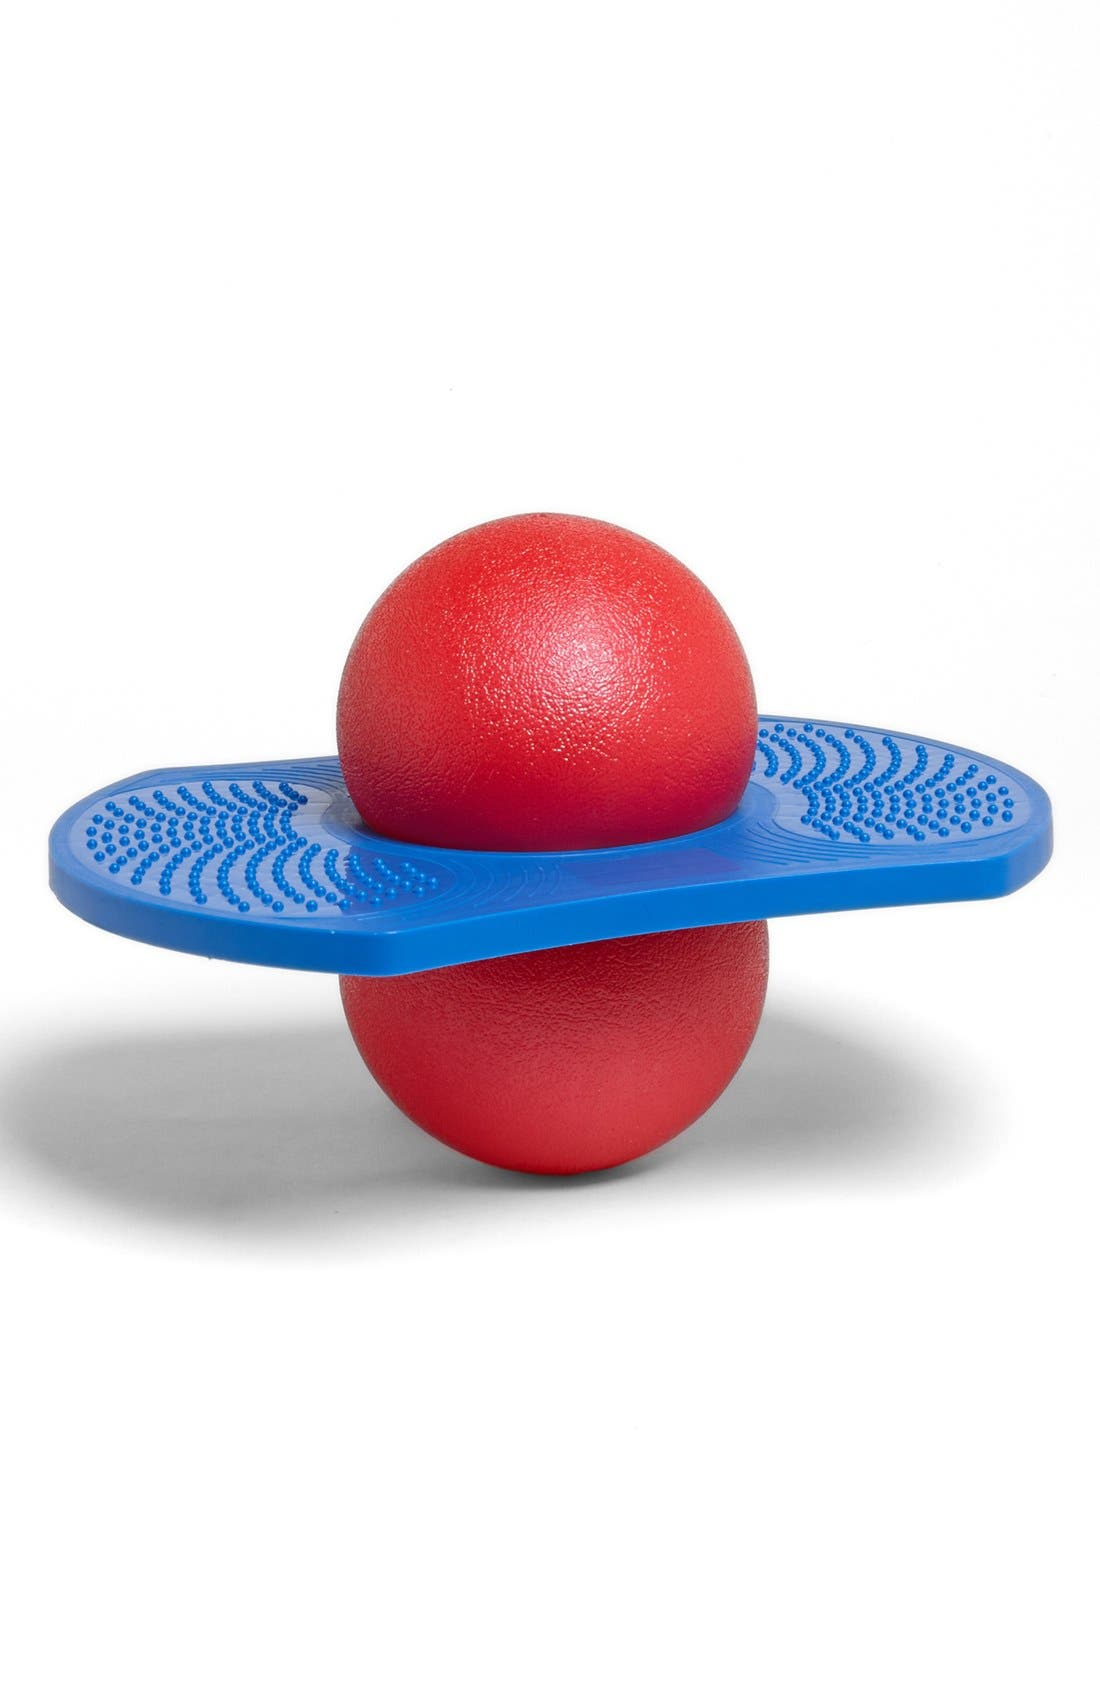 Alternate Image 1 Selected - Geospace International Toys 'Air Pogo' Jumper